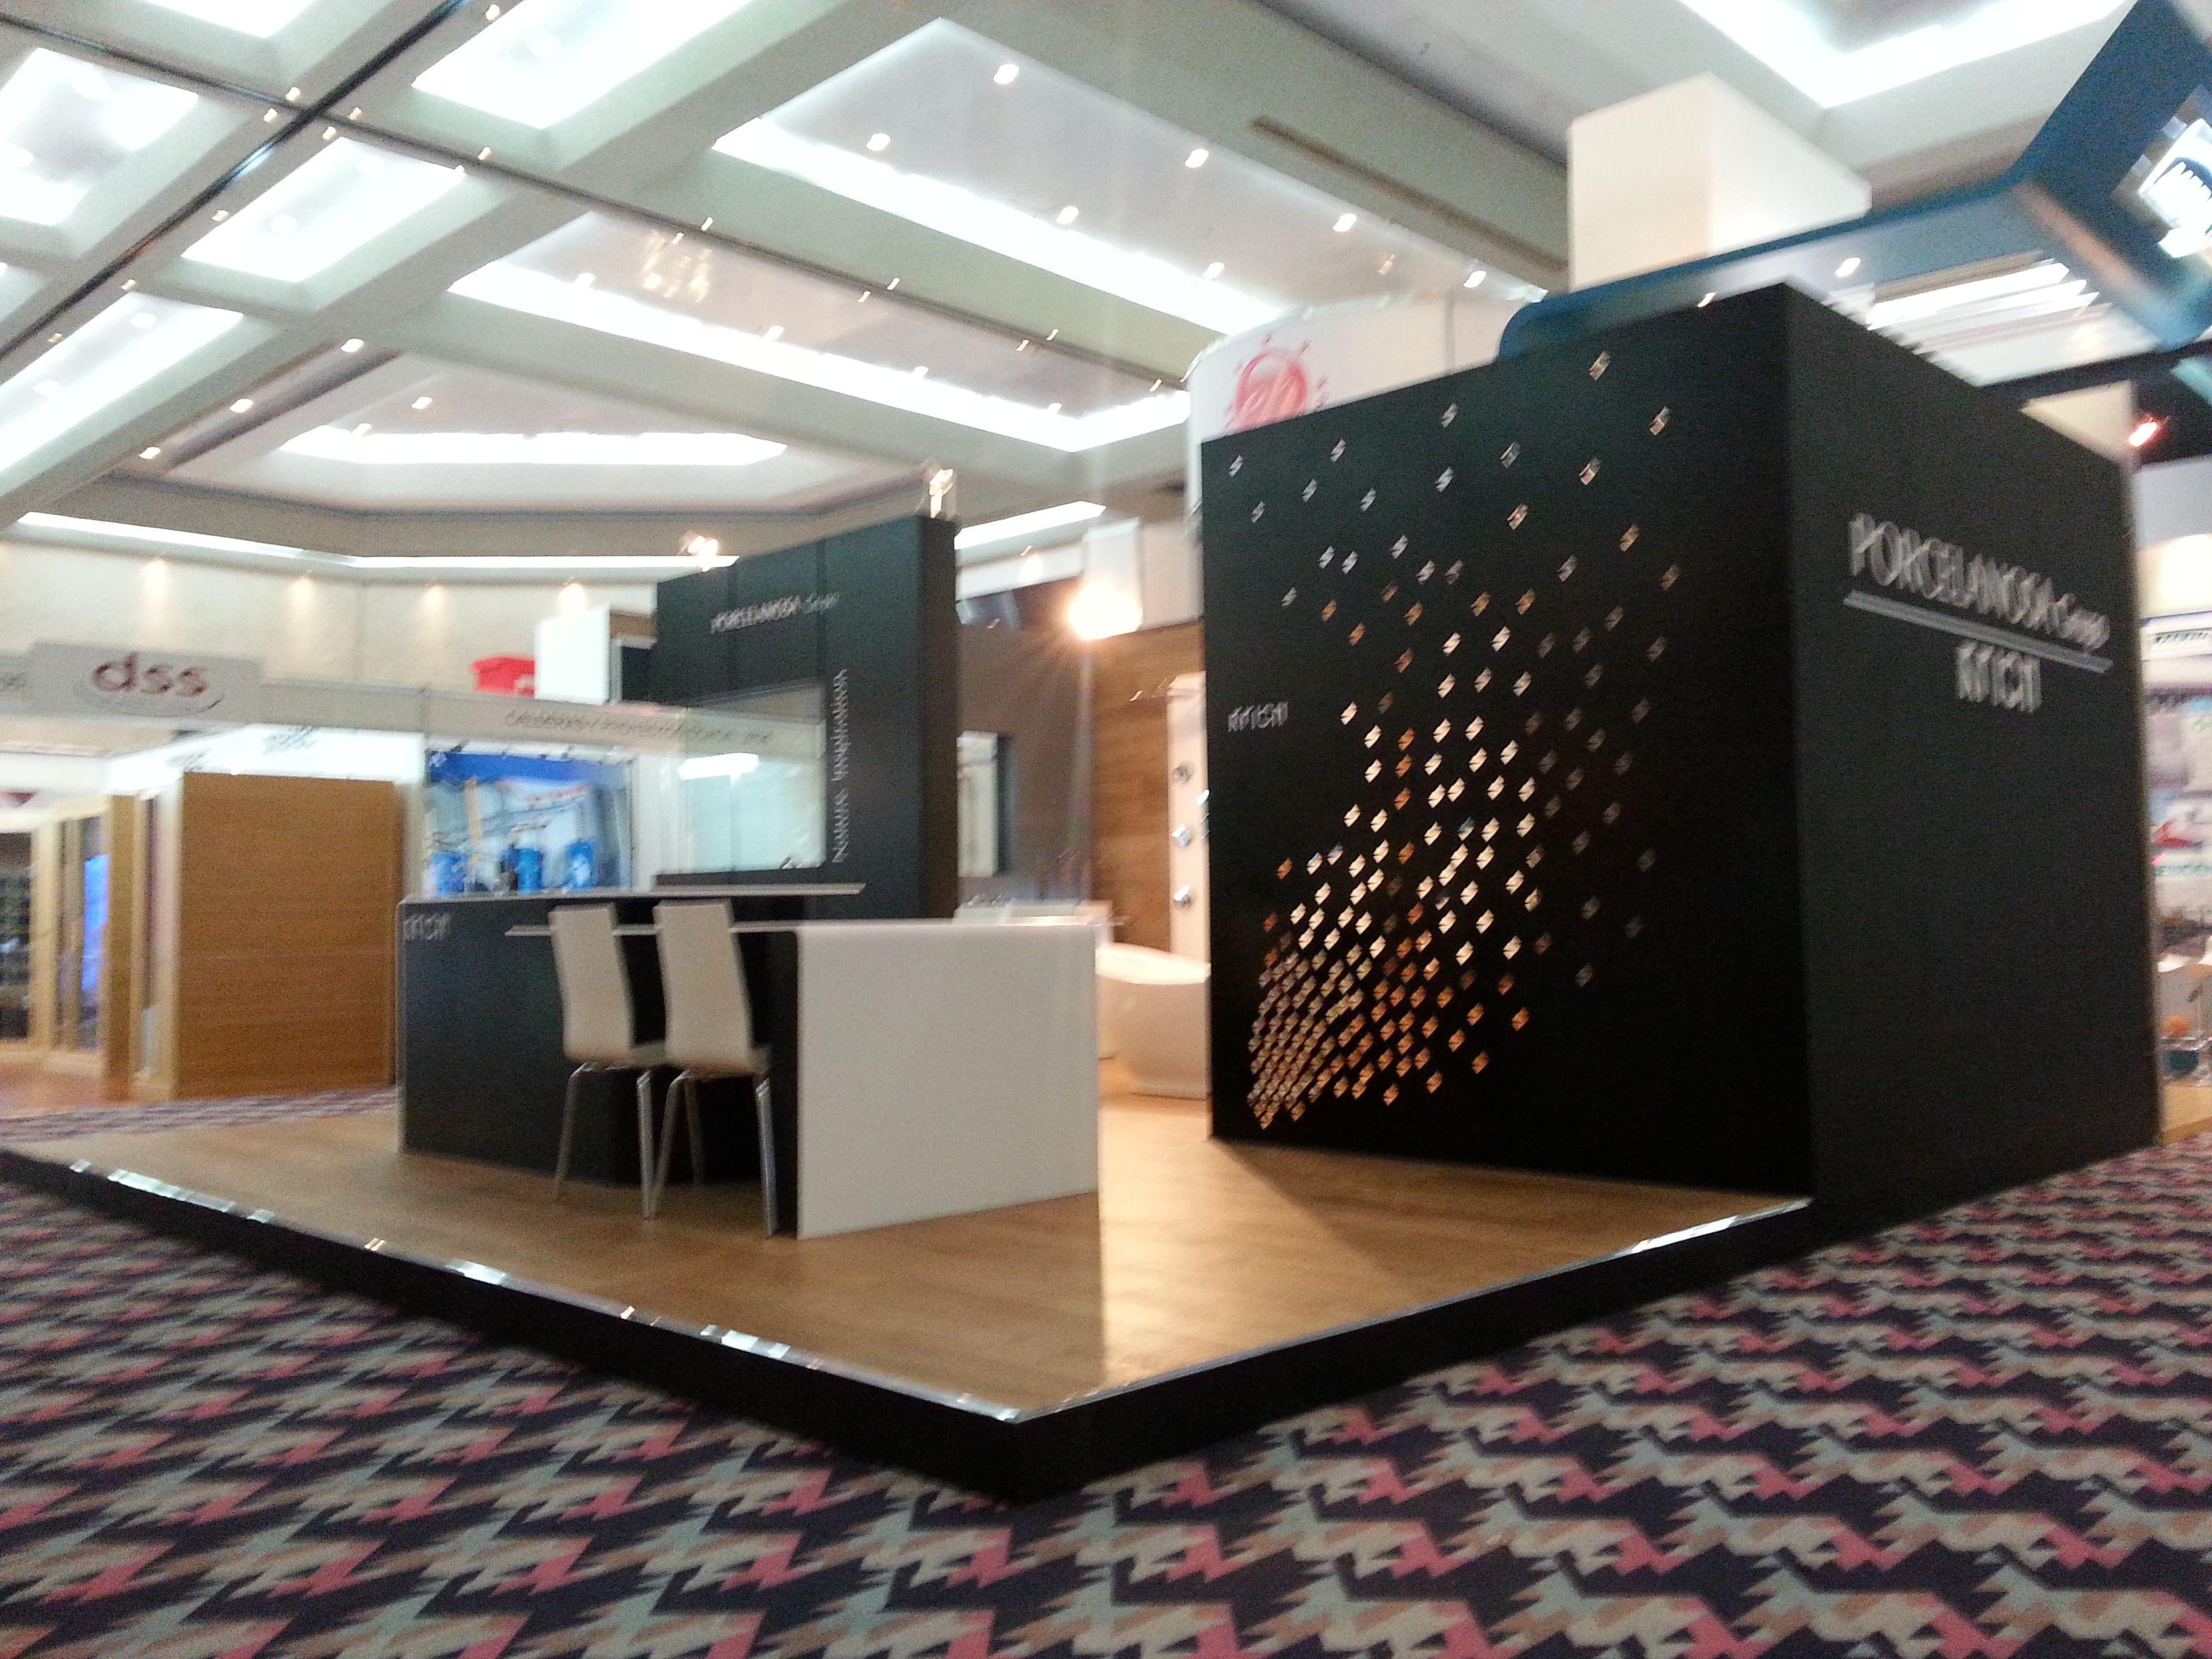 Expo Stands Montajes 2003 : Diseño stands stand portatil para exposiciones expo renta